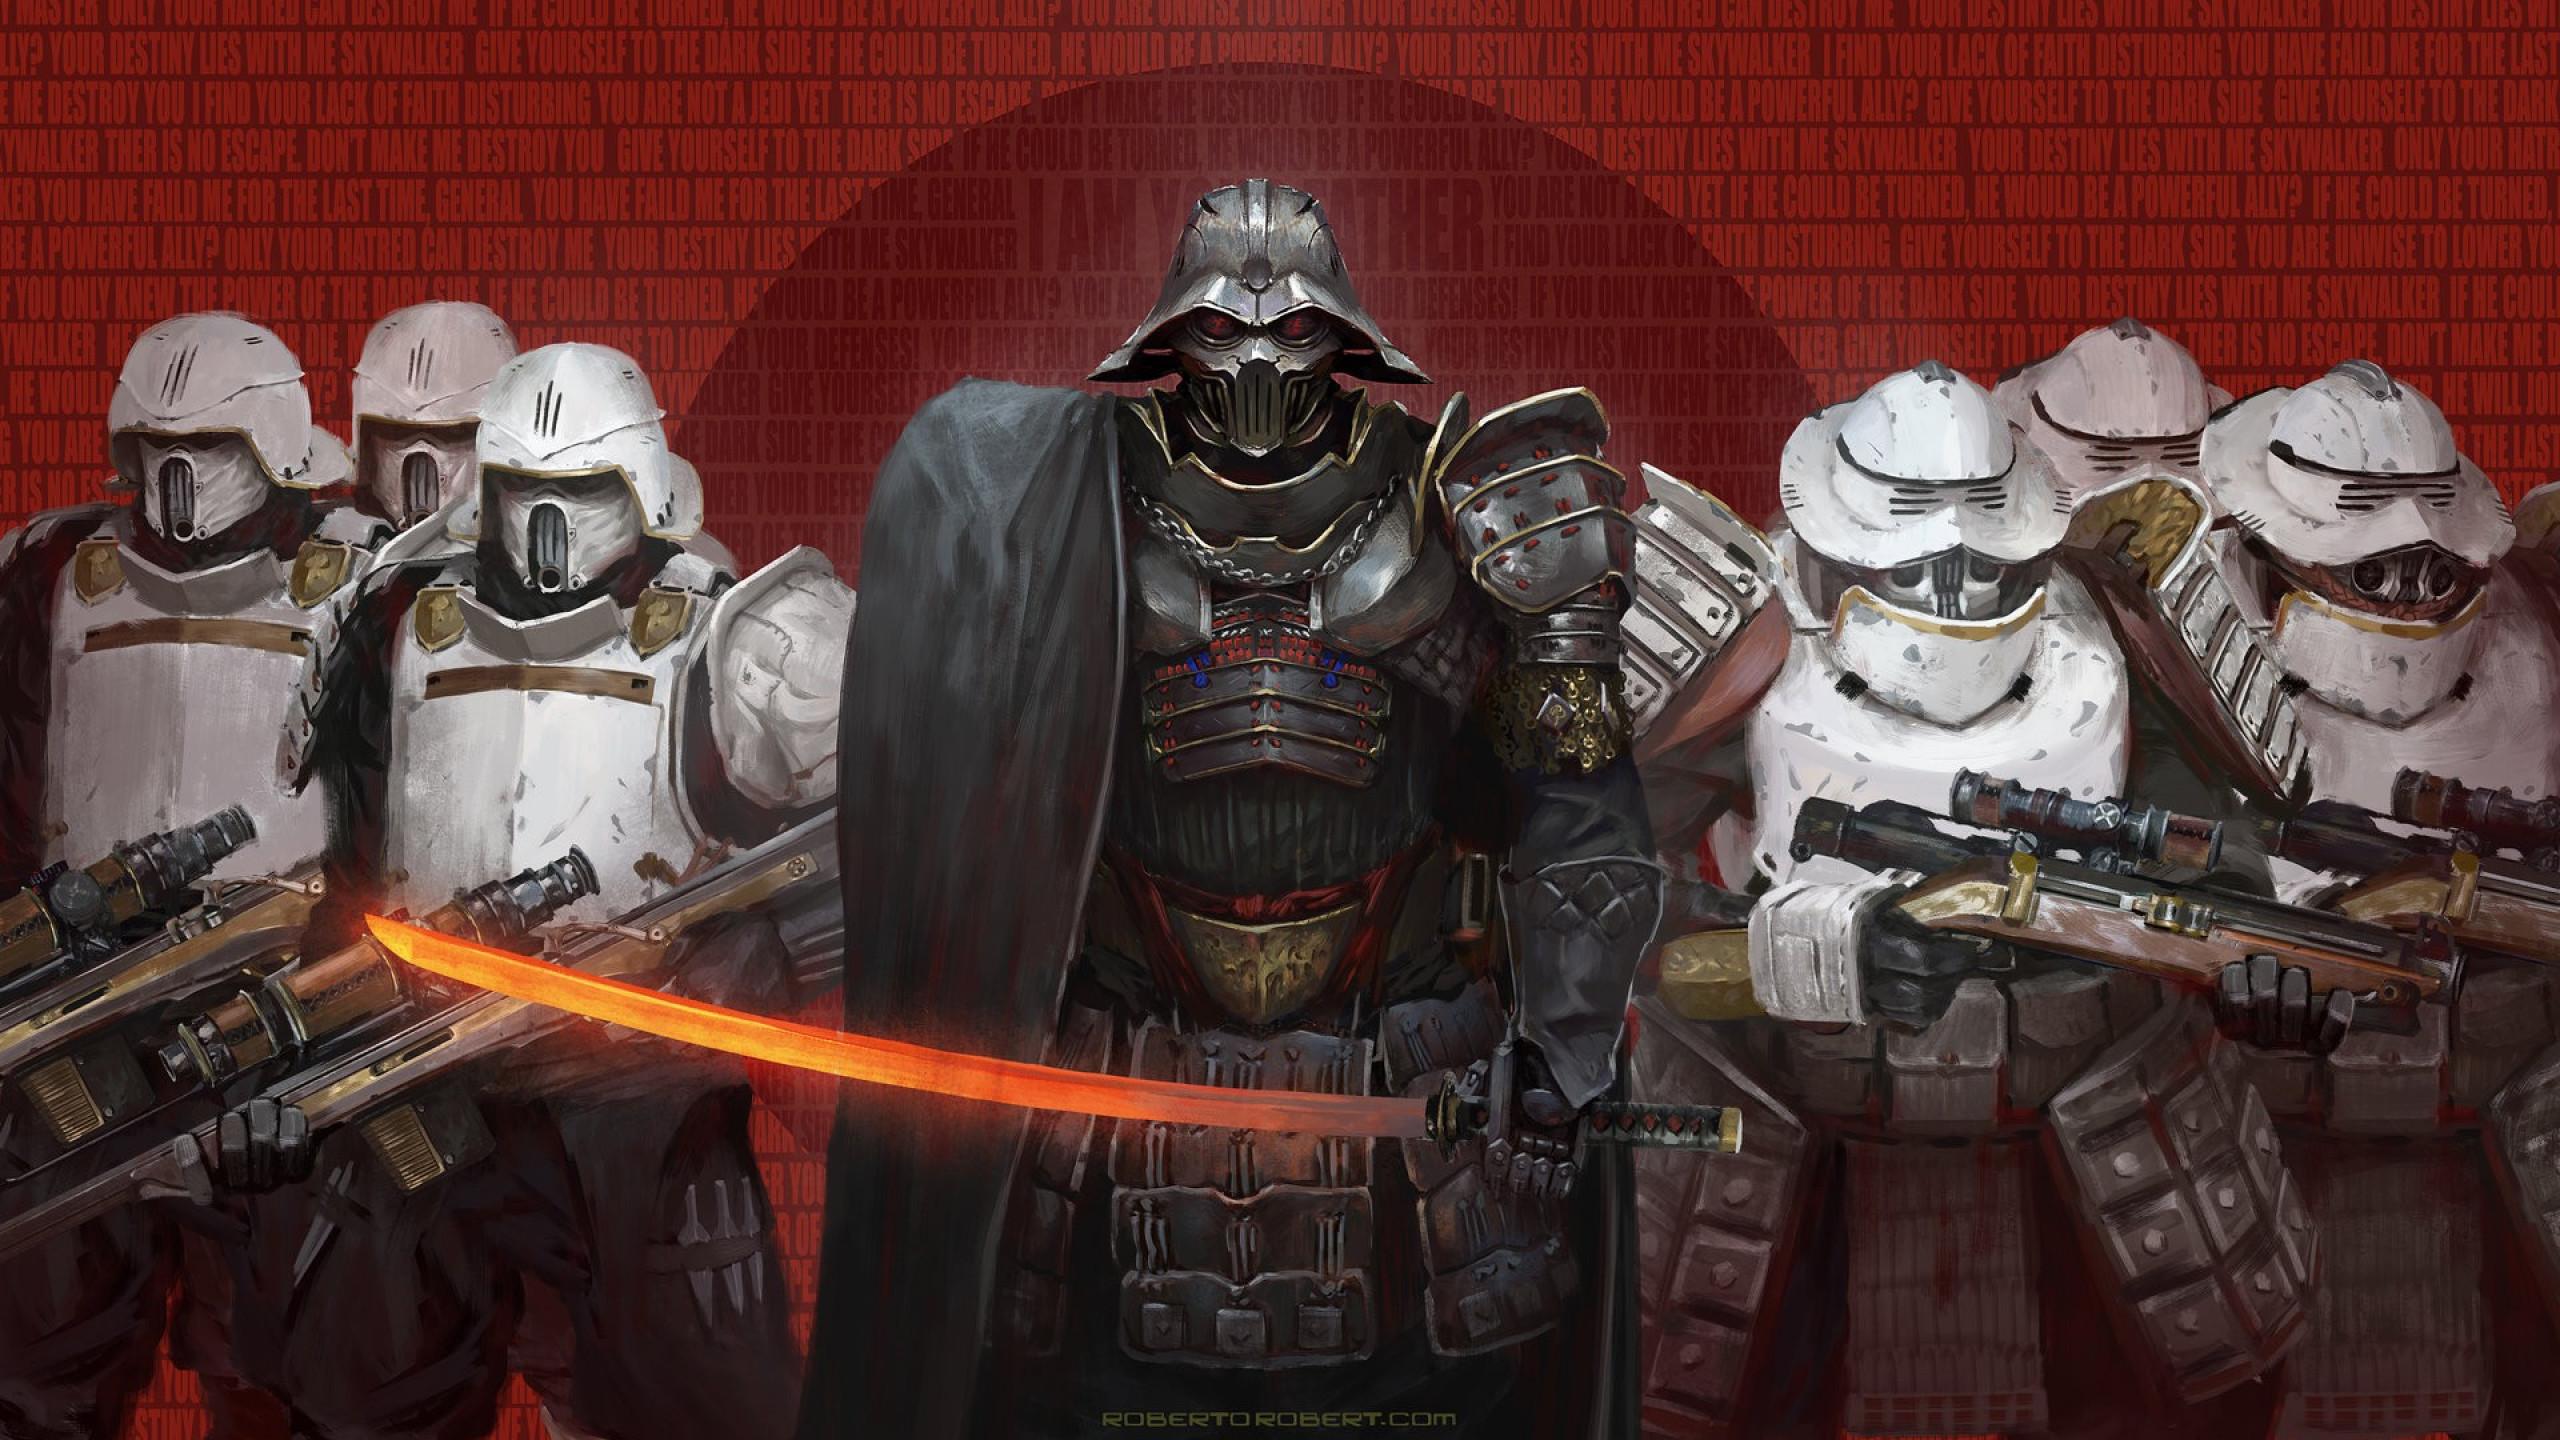 Download science fiction, samurai, Star Wars, Darth Vader, sword,  art Wallpapers